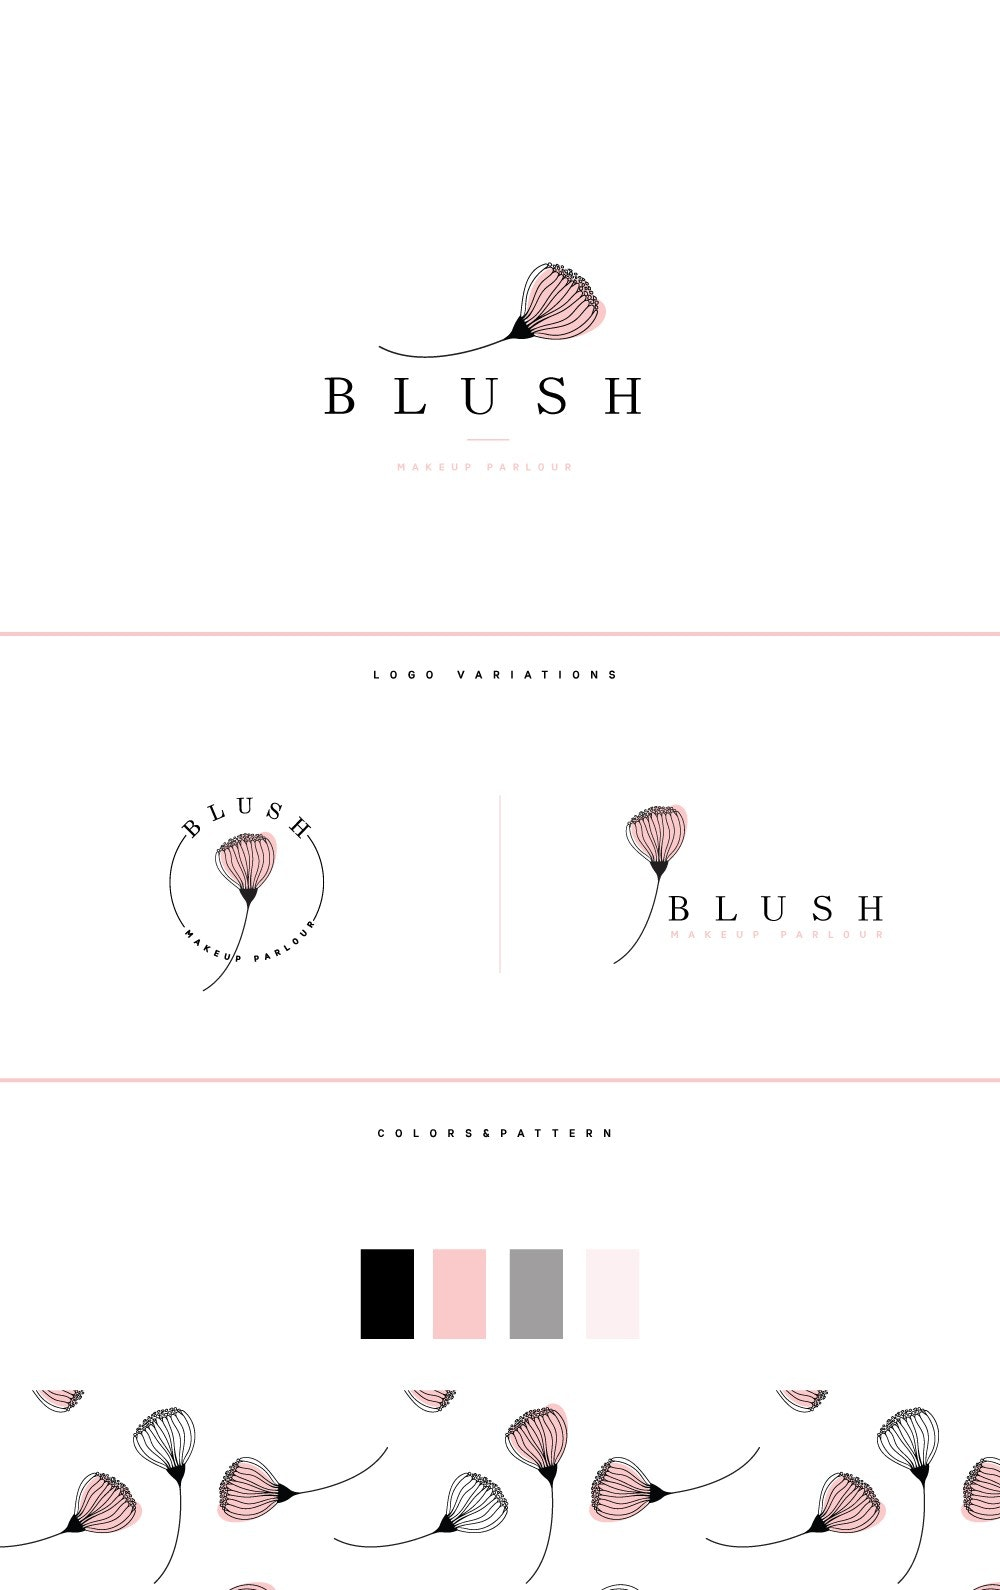 Blush Makeup Parlour logo